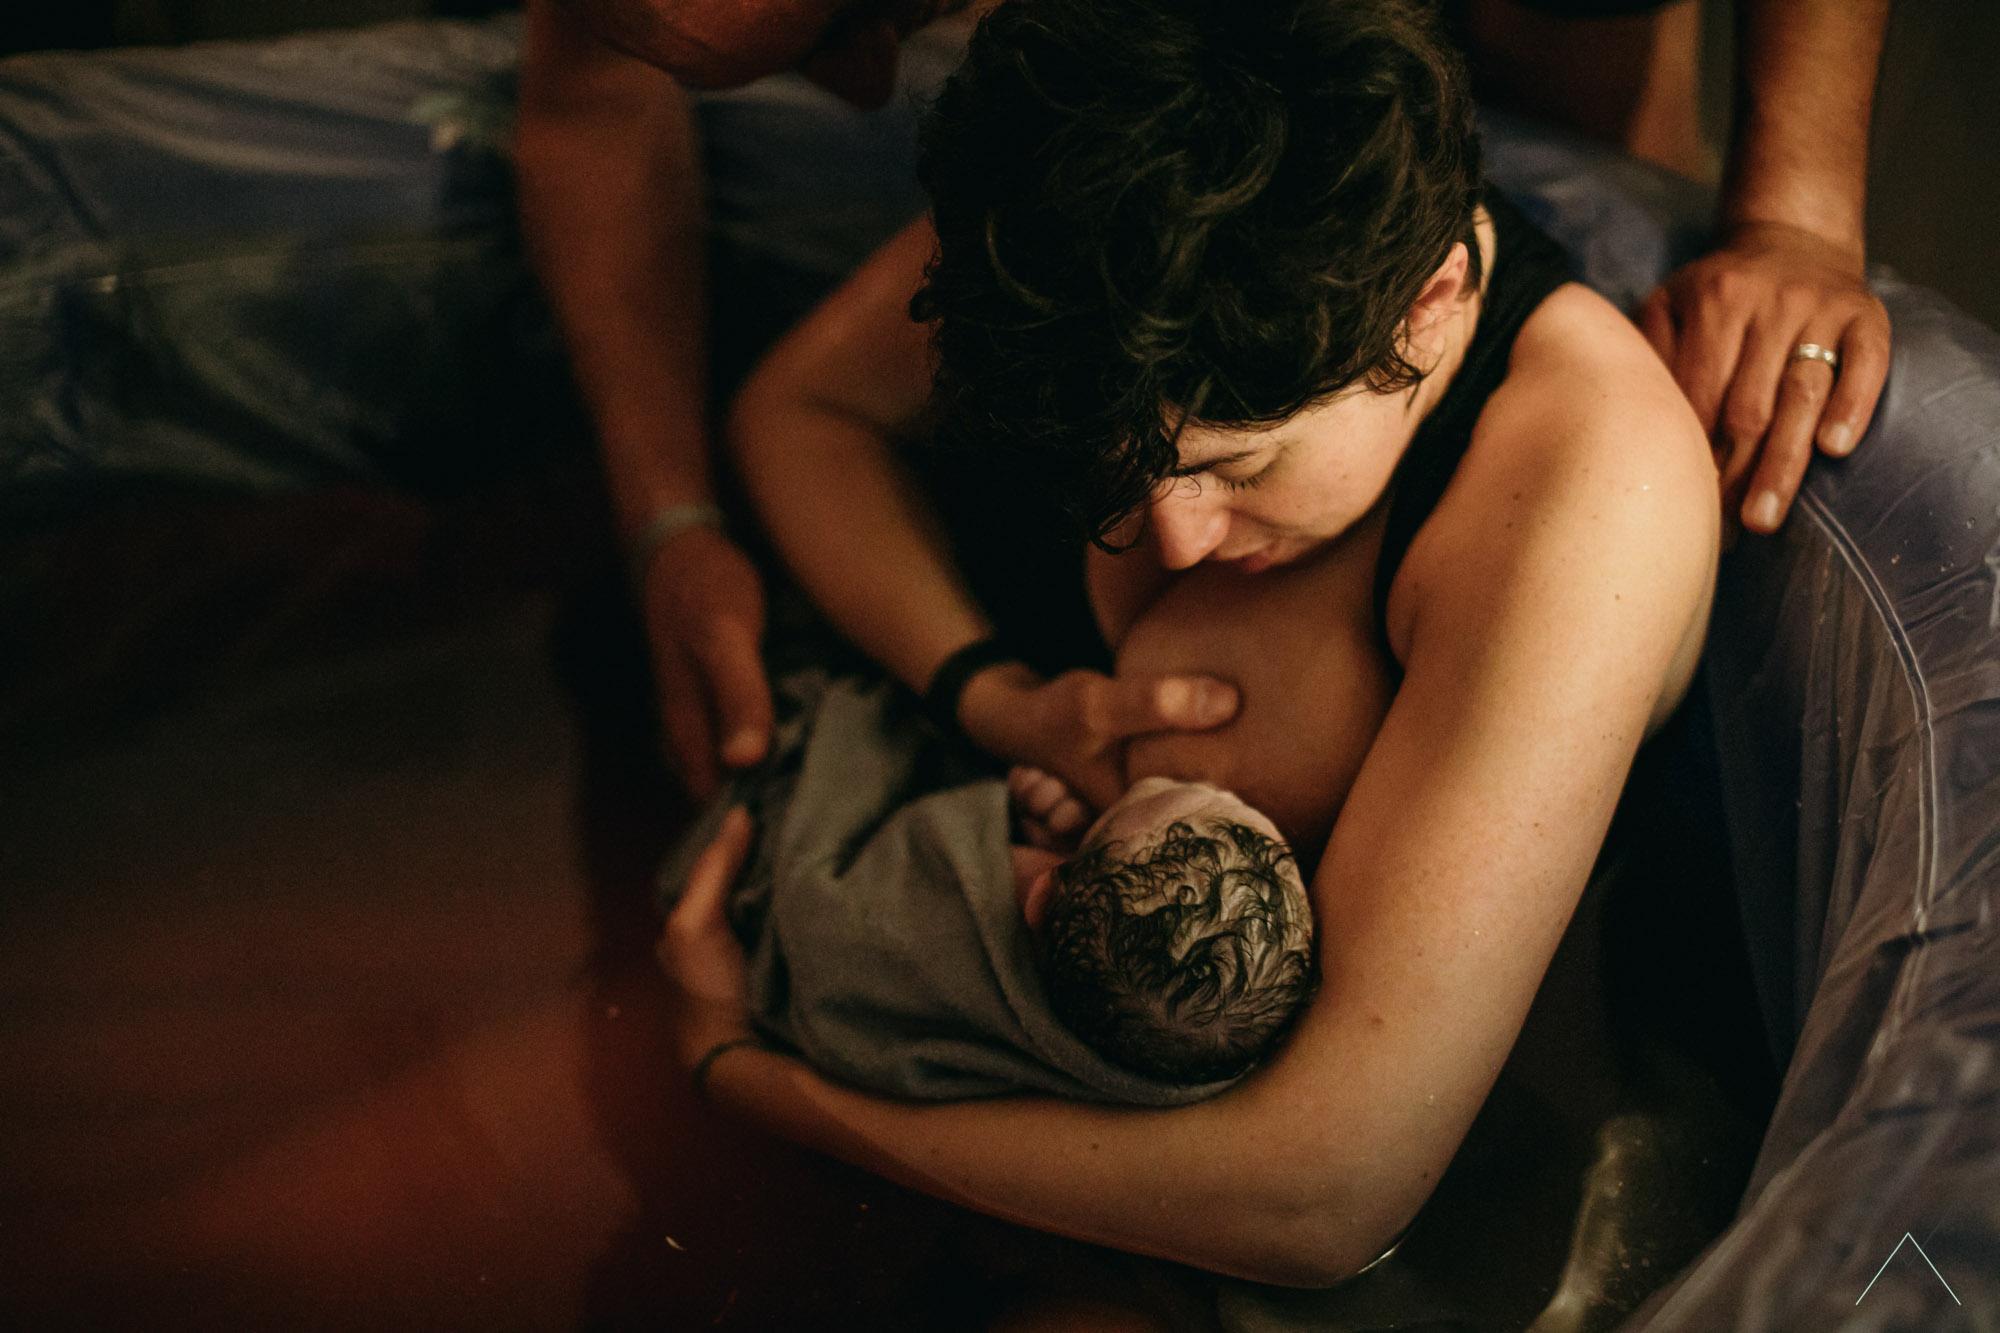 vanessa amiot photographe- accouchement a domicile - aad -photographe grossesse thonon